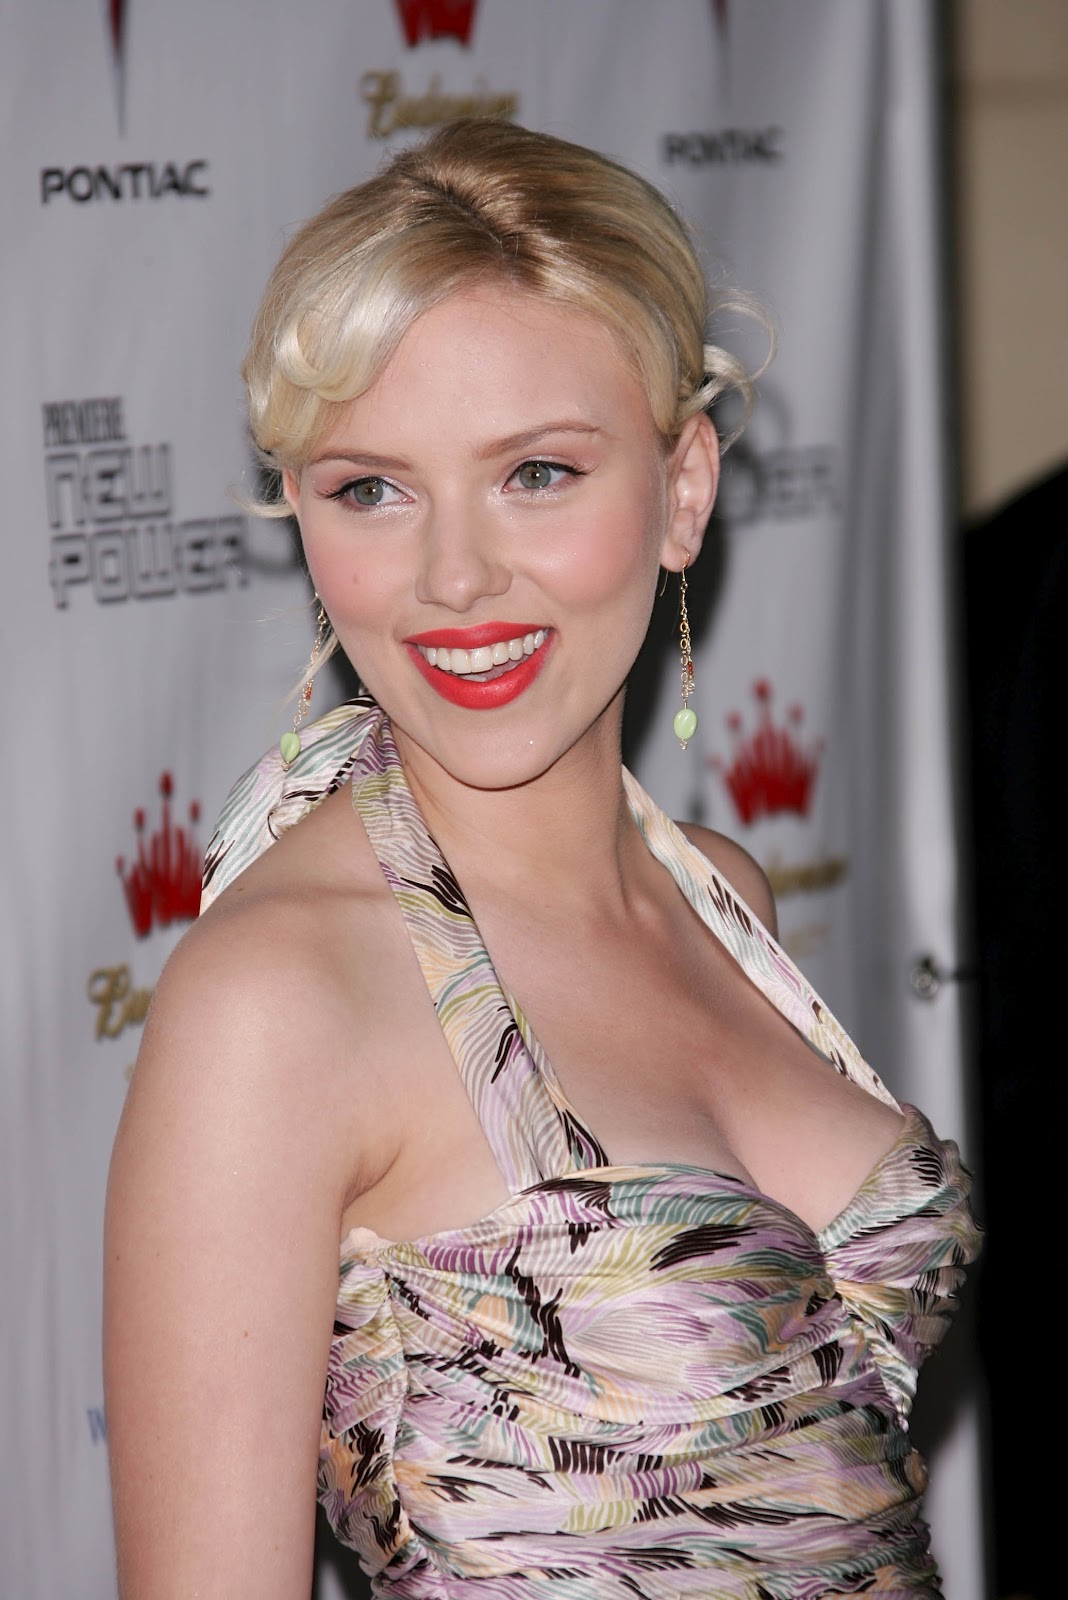 Scarlett Johansson in 2020 | Scarlett johansson, Scarlett